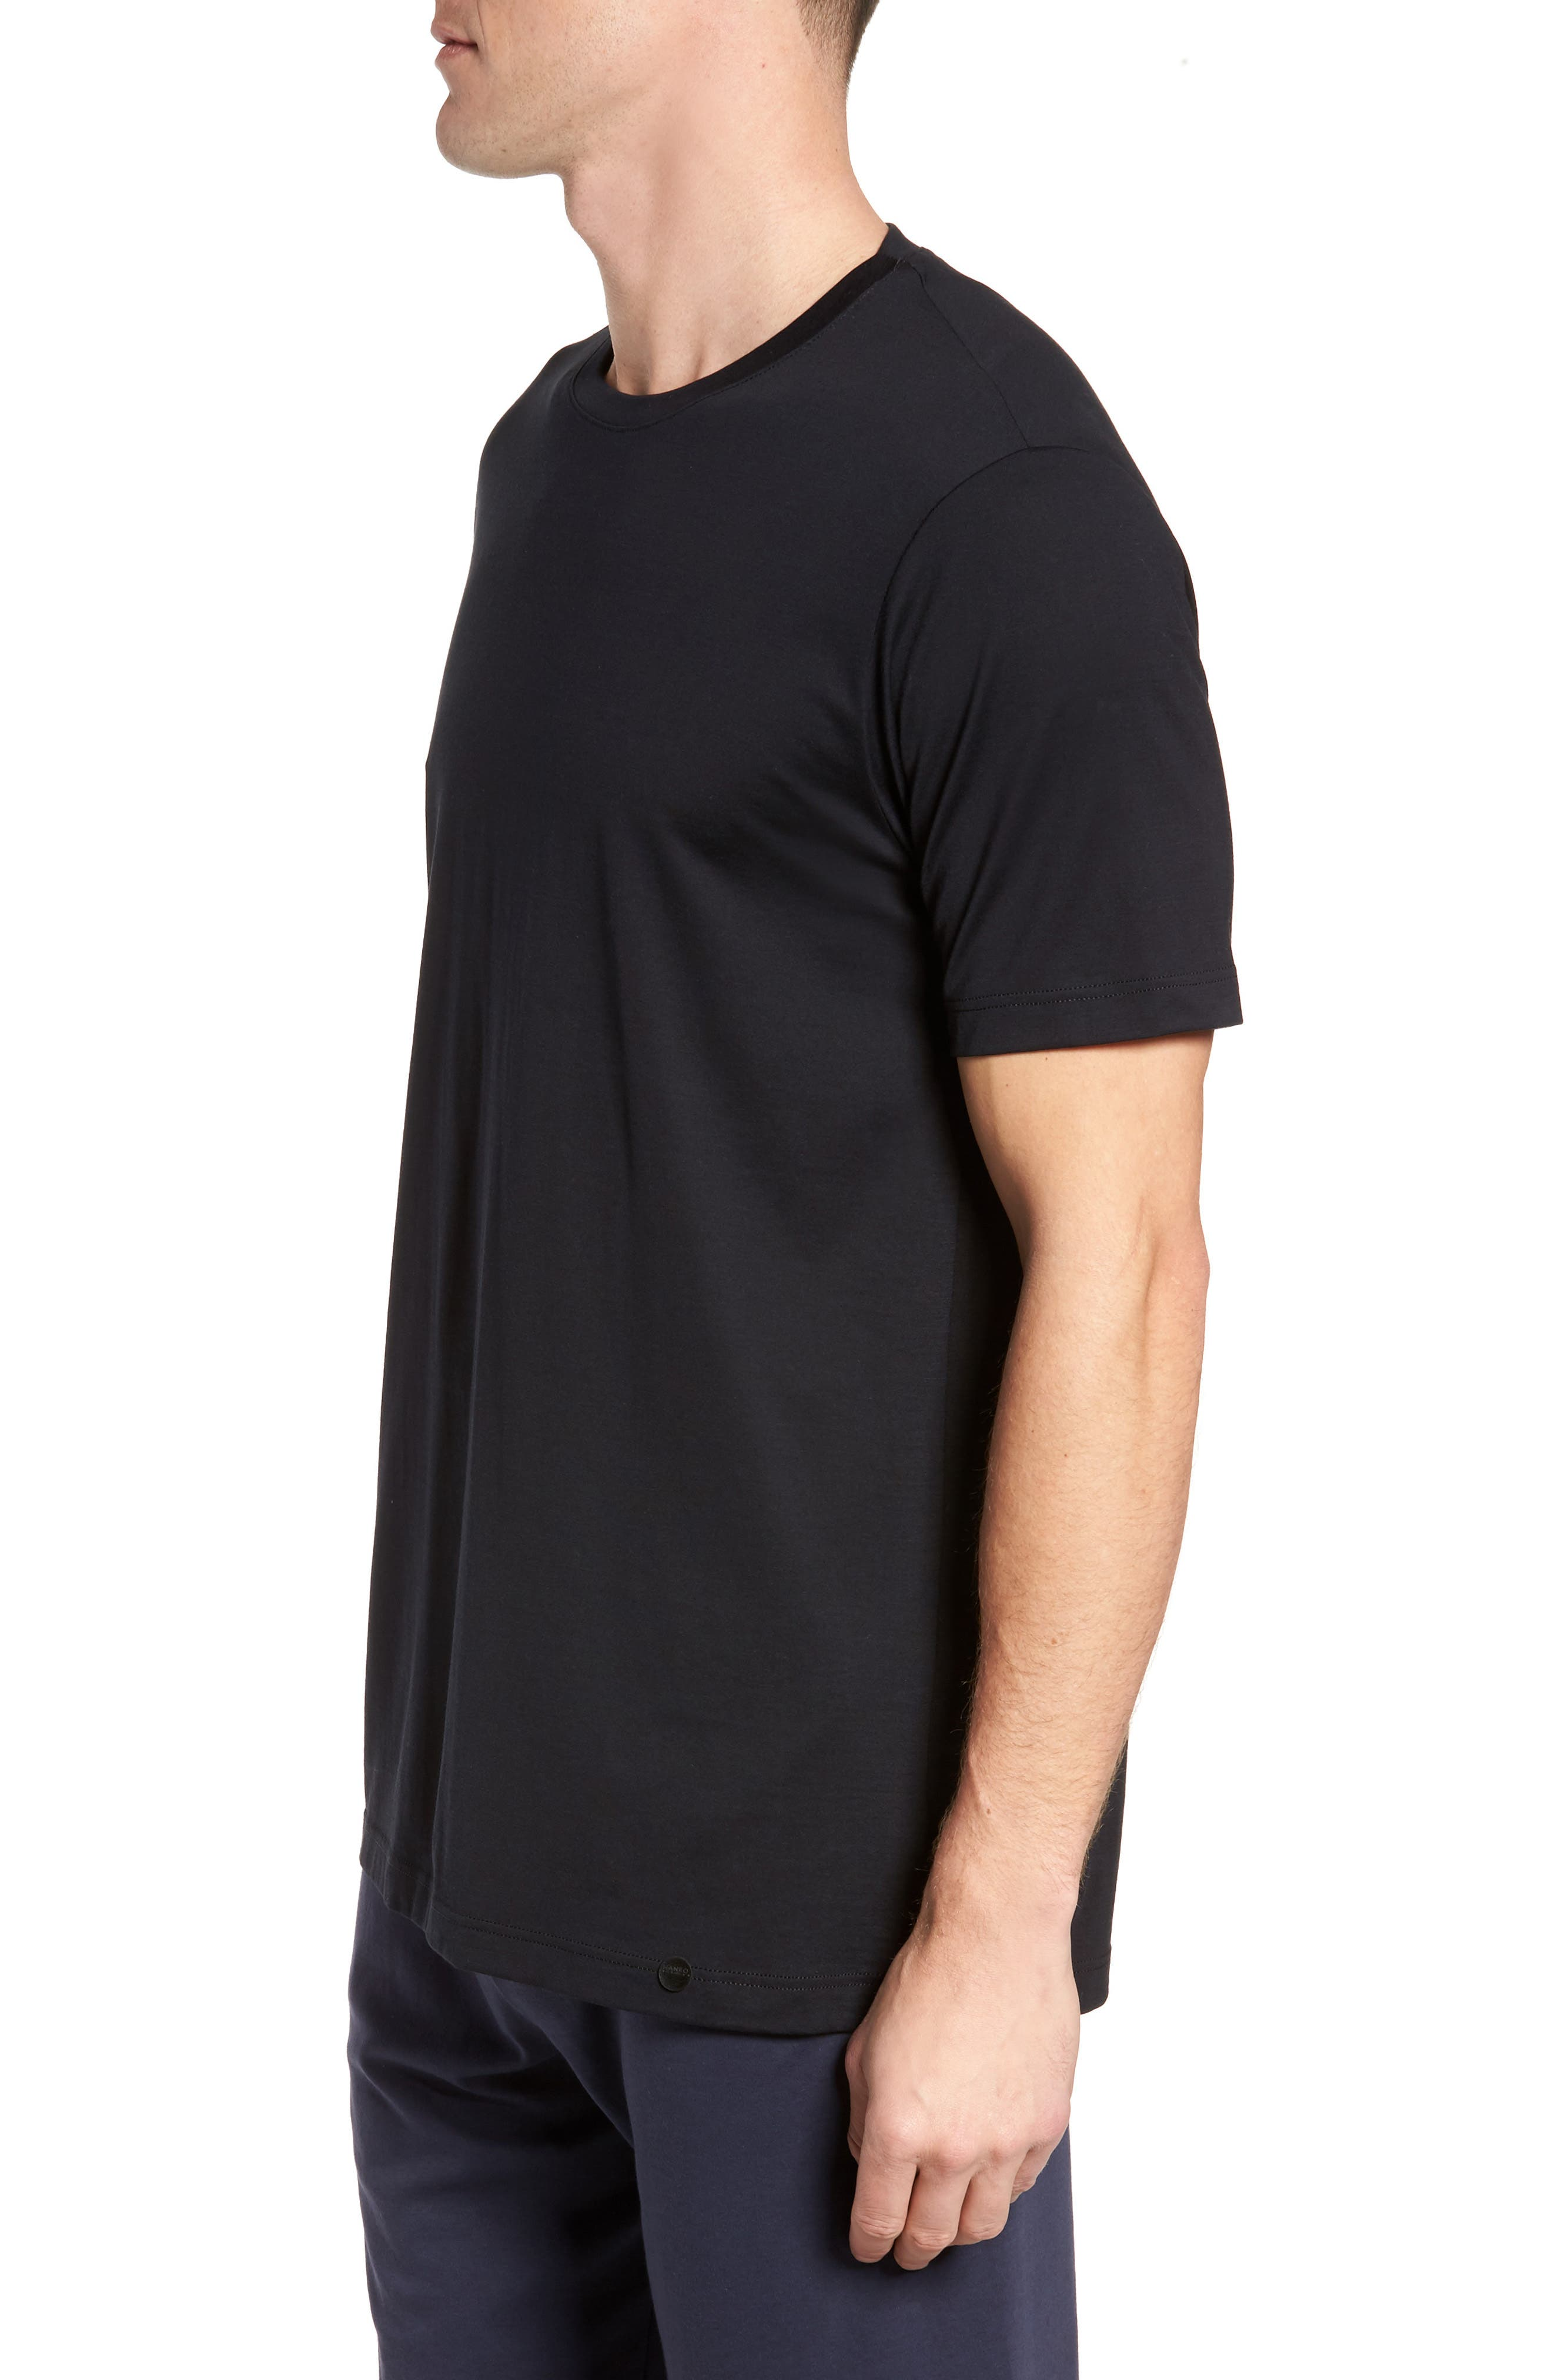 Night & Day Crewneck T-Shirt,                             Alternate thumbnail 3, color,                             BLACK